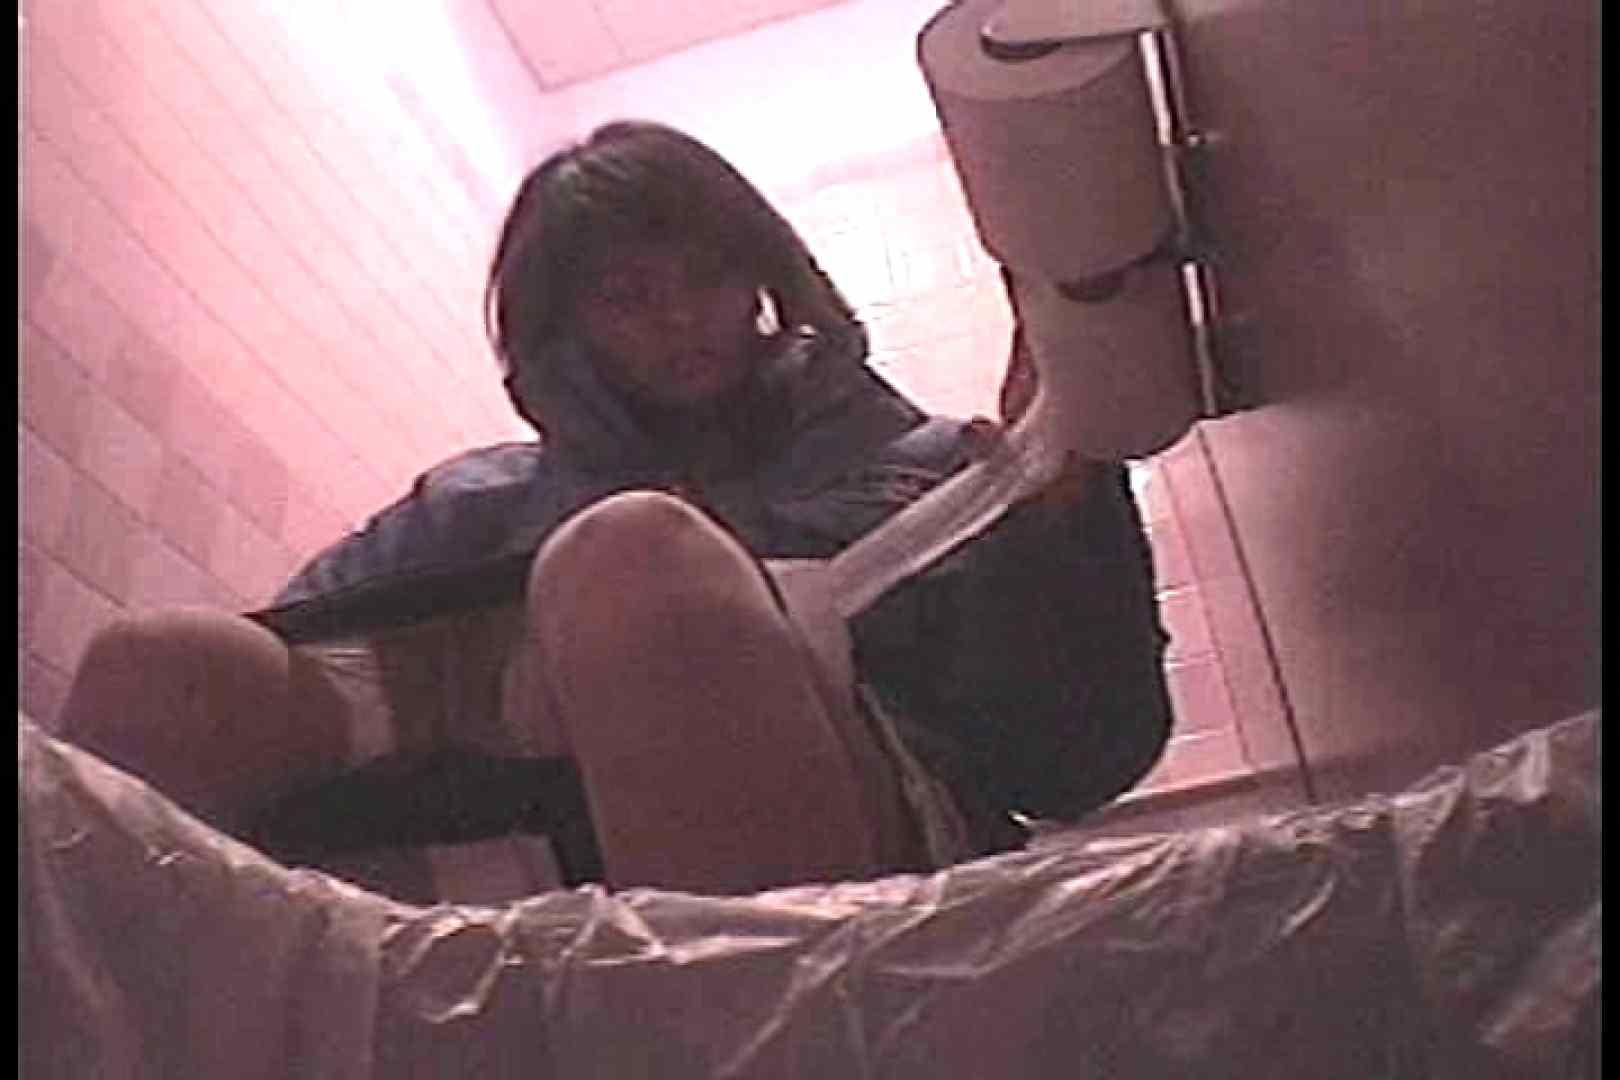 RQT高画質版Vol.4 モロだしオマンコ セックス無修正動画無料 70pic 47